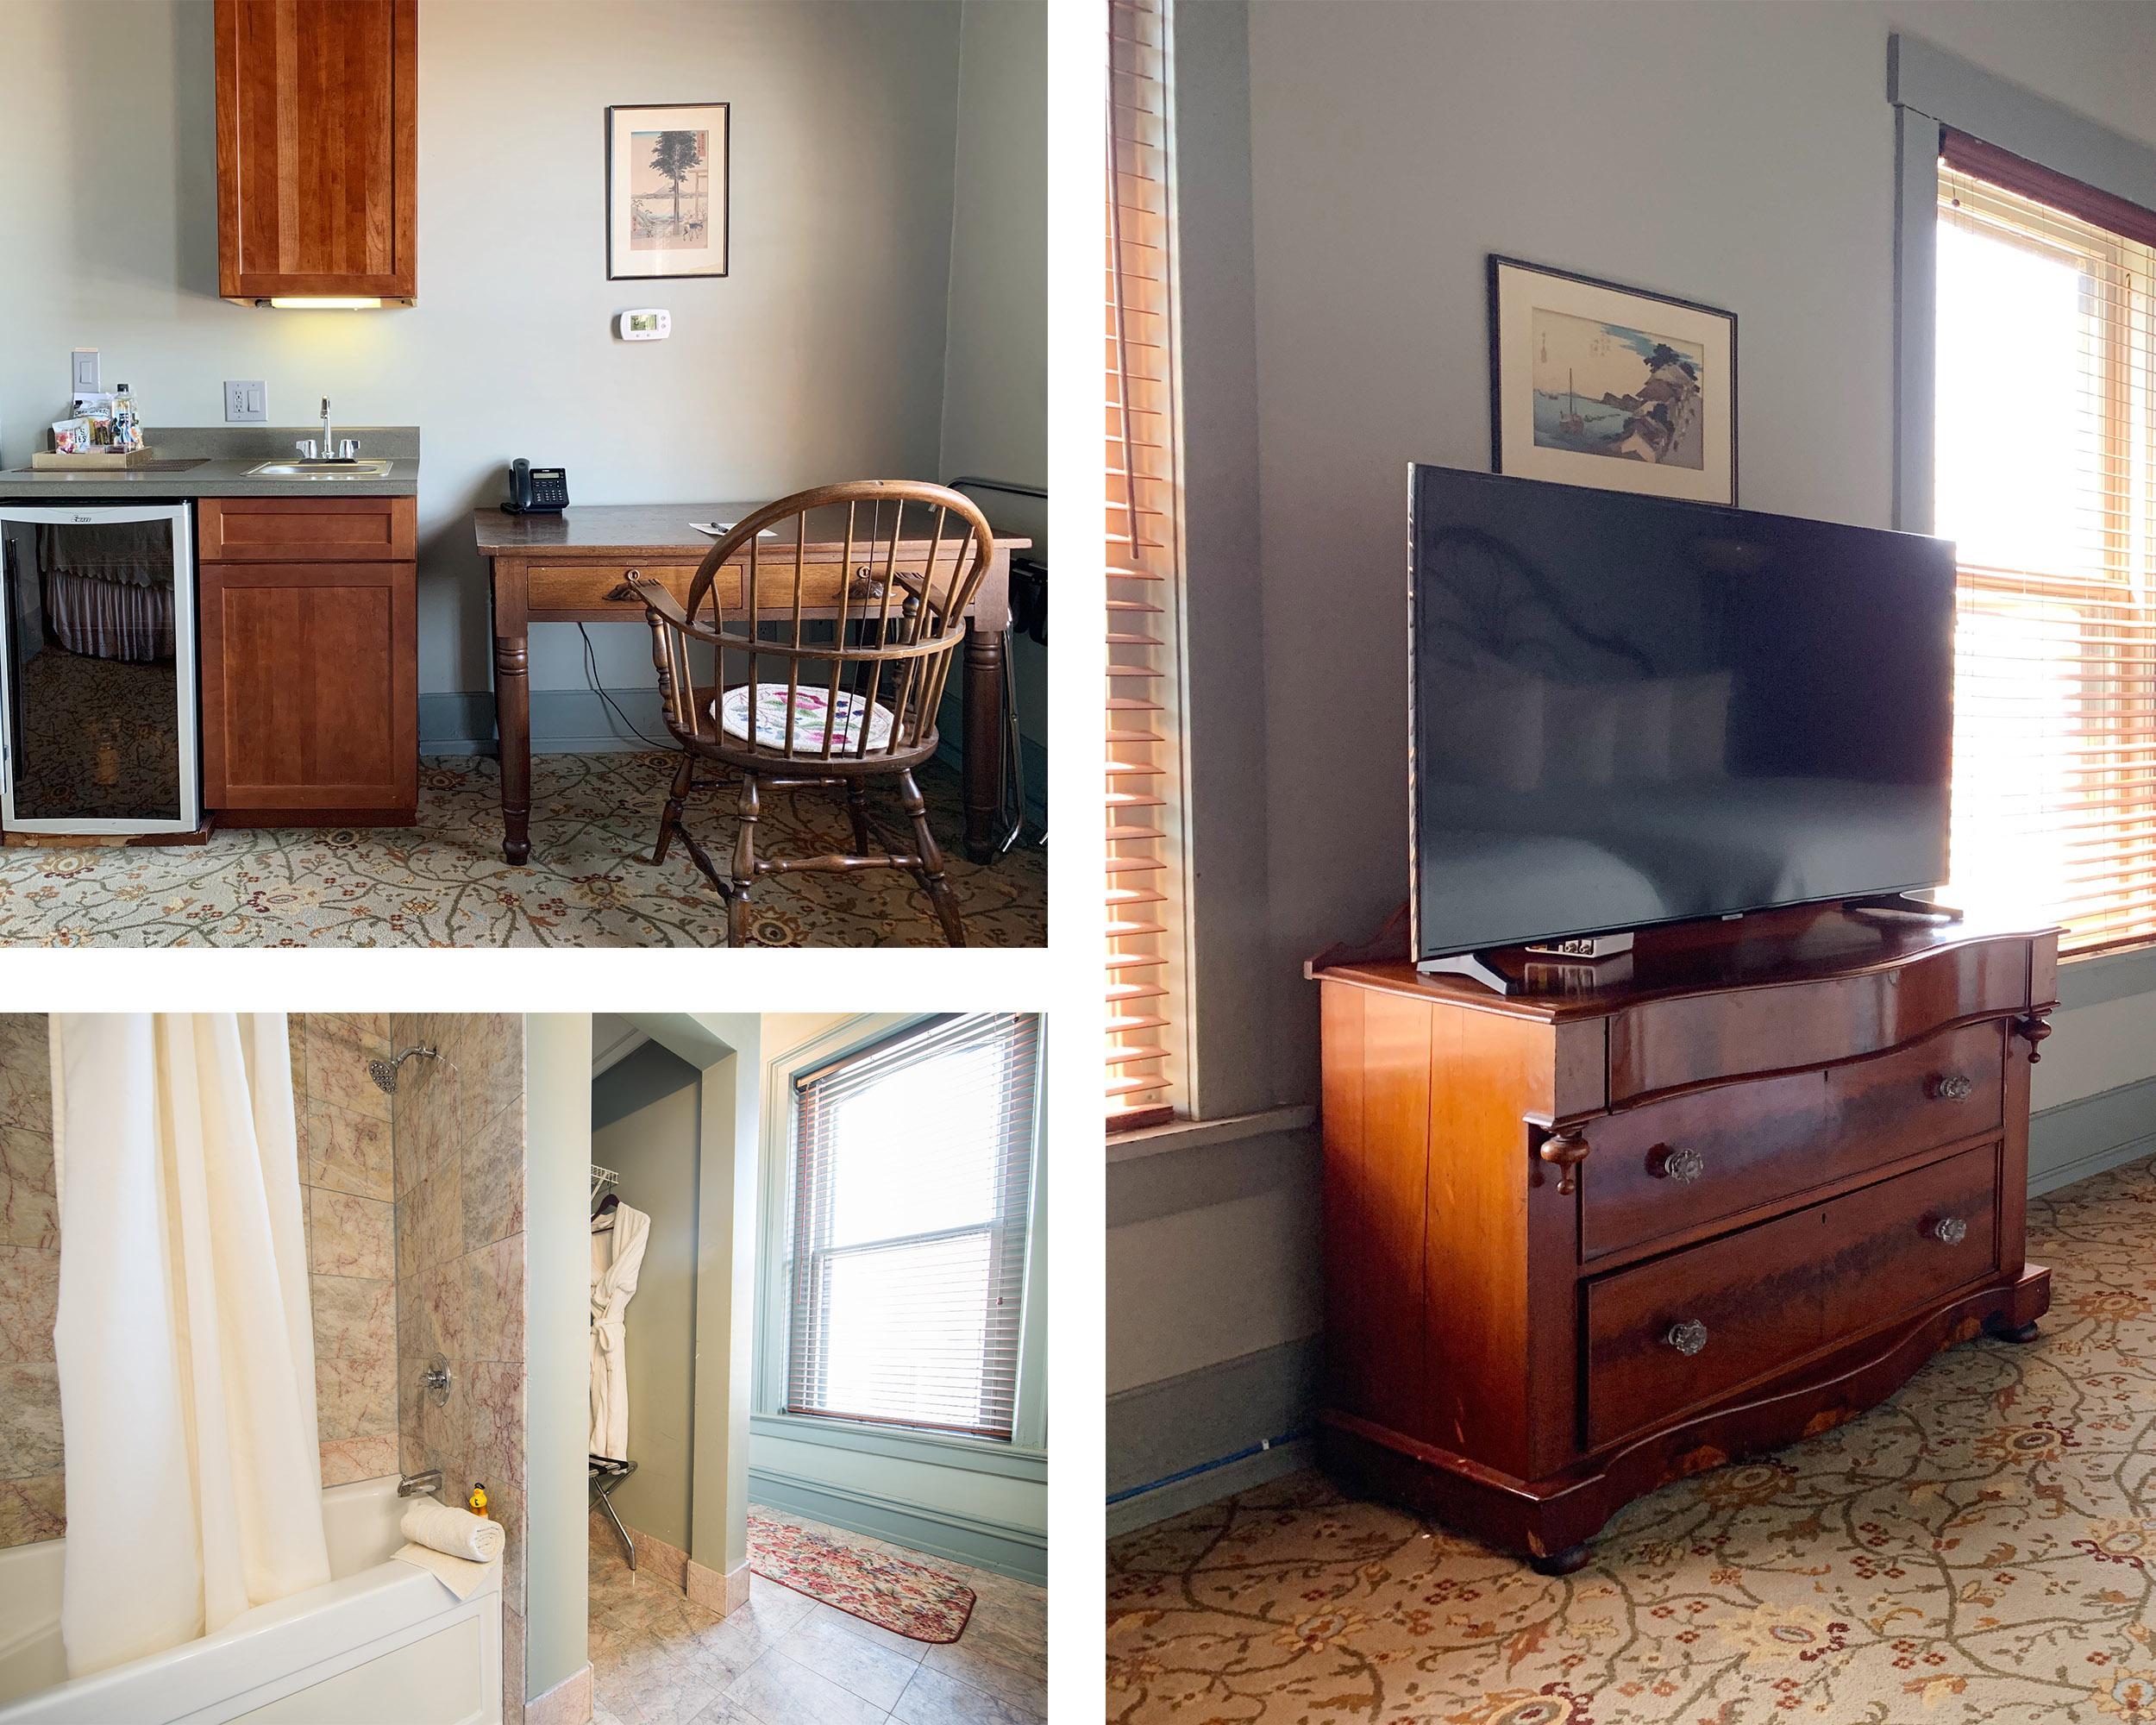 TV, kitchenette, bath